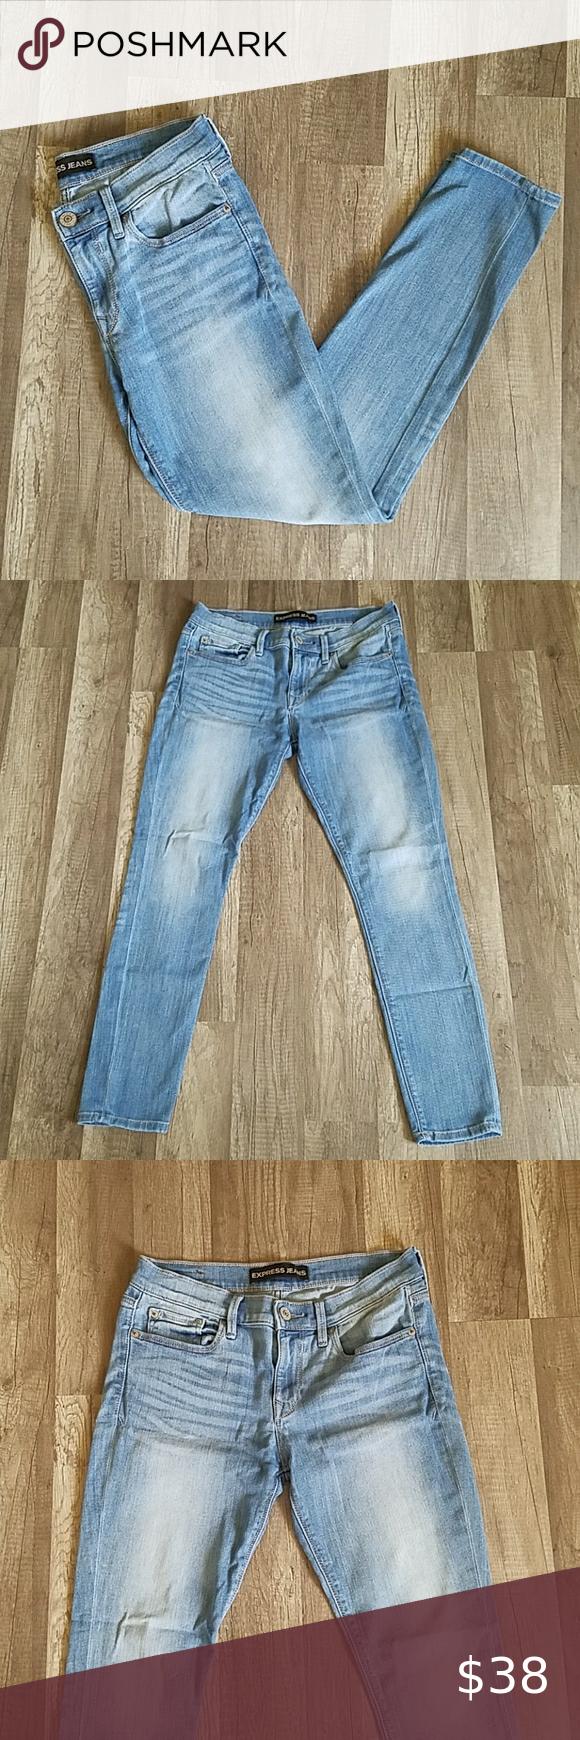 Express Legging Mid Rise Light Blue Jeans 4 Short Express Leggings Light Blue Jeans Skinny Jeans Fall